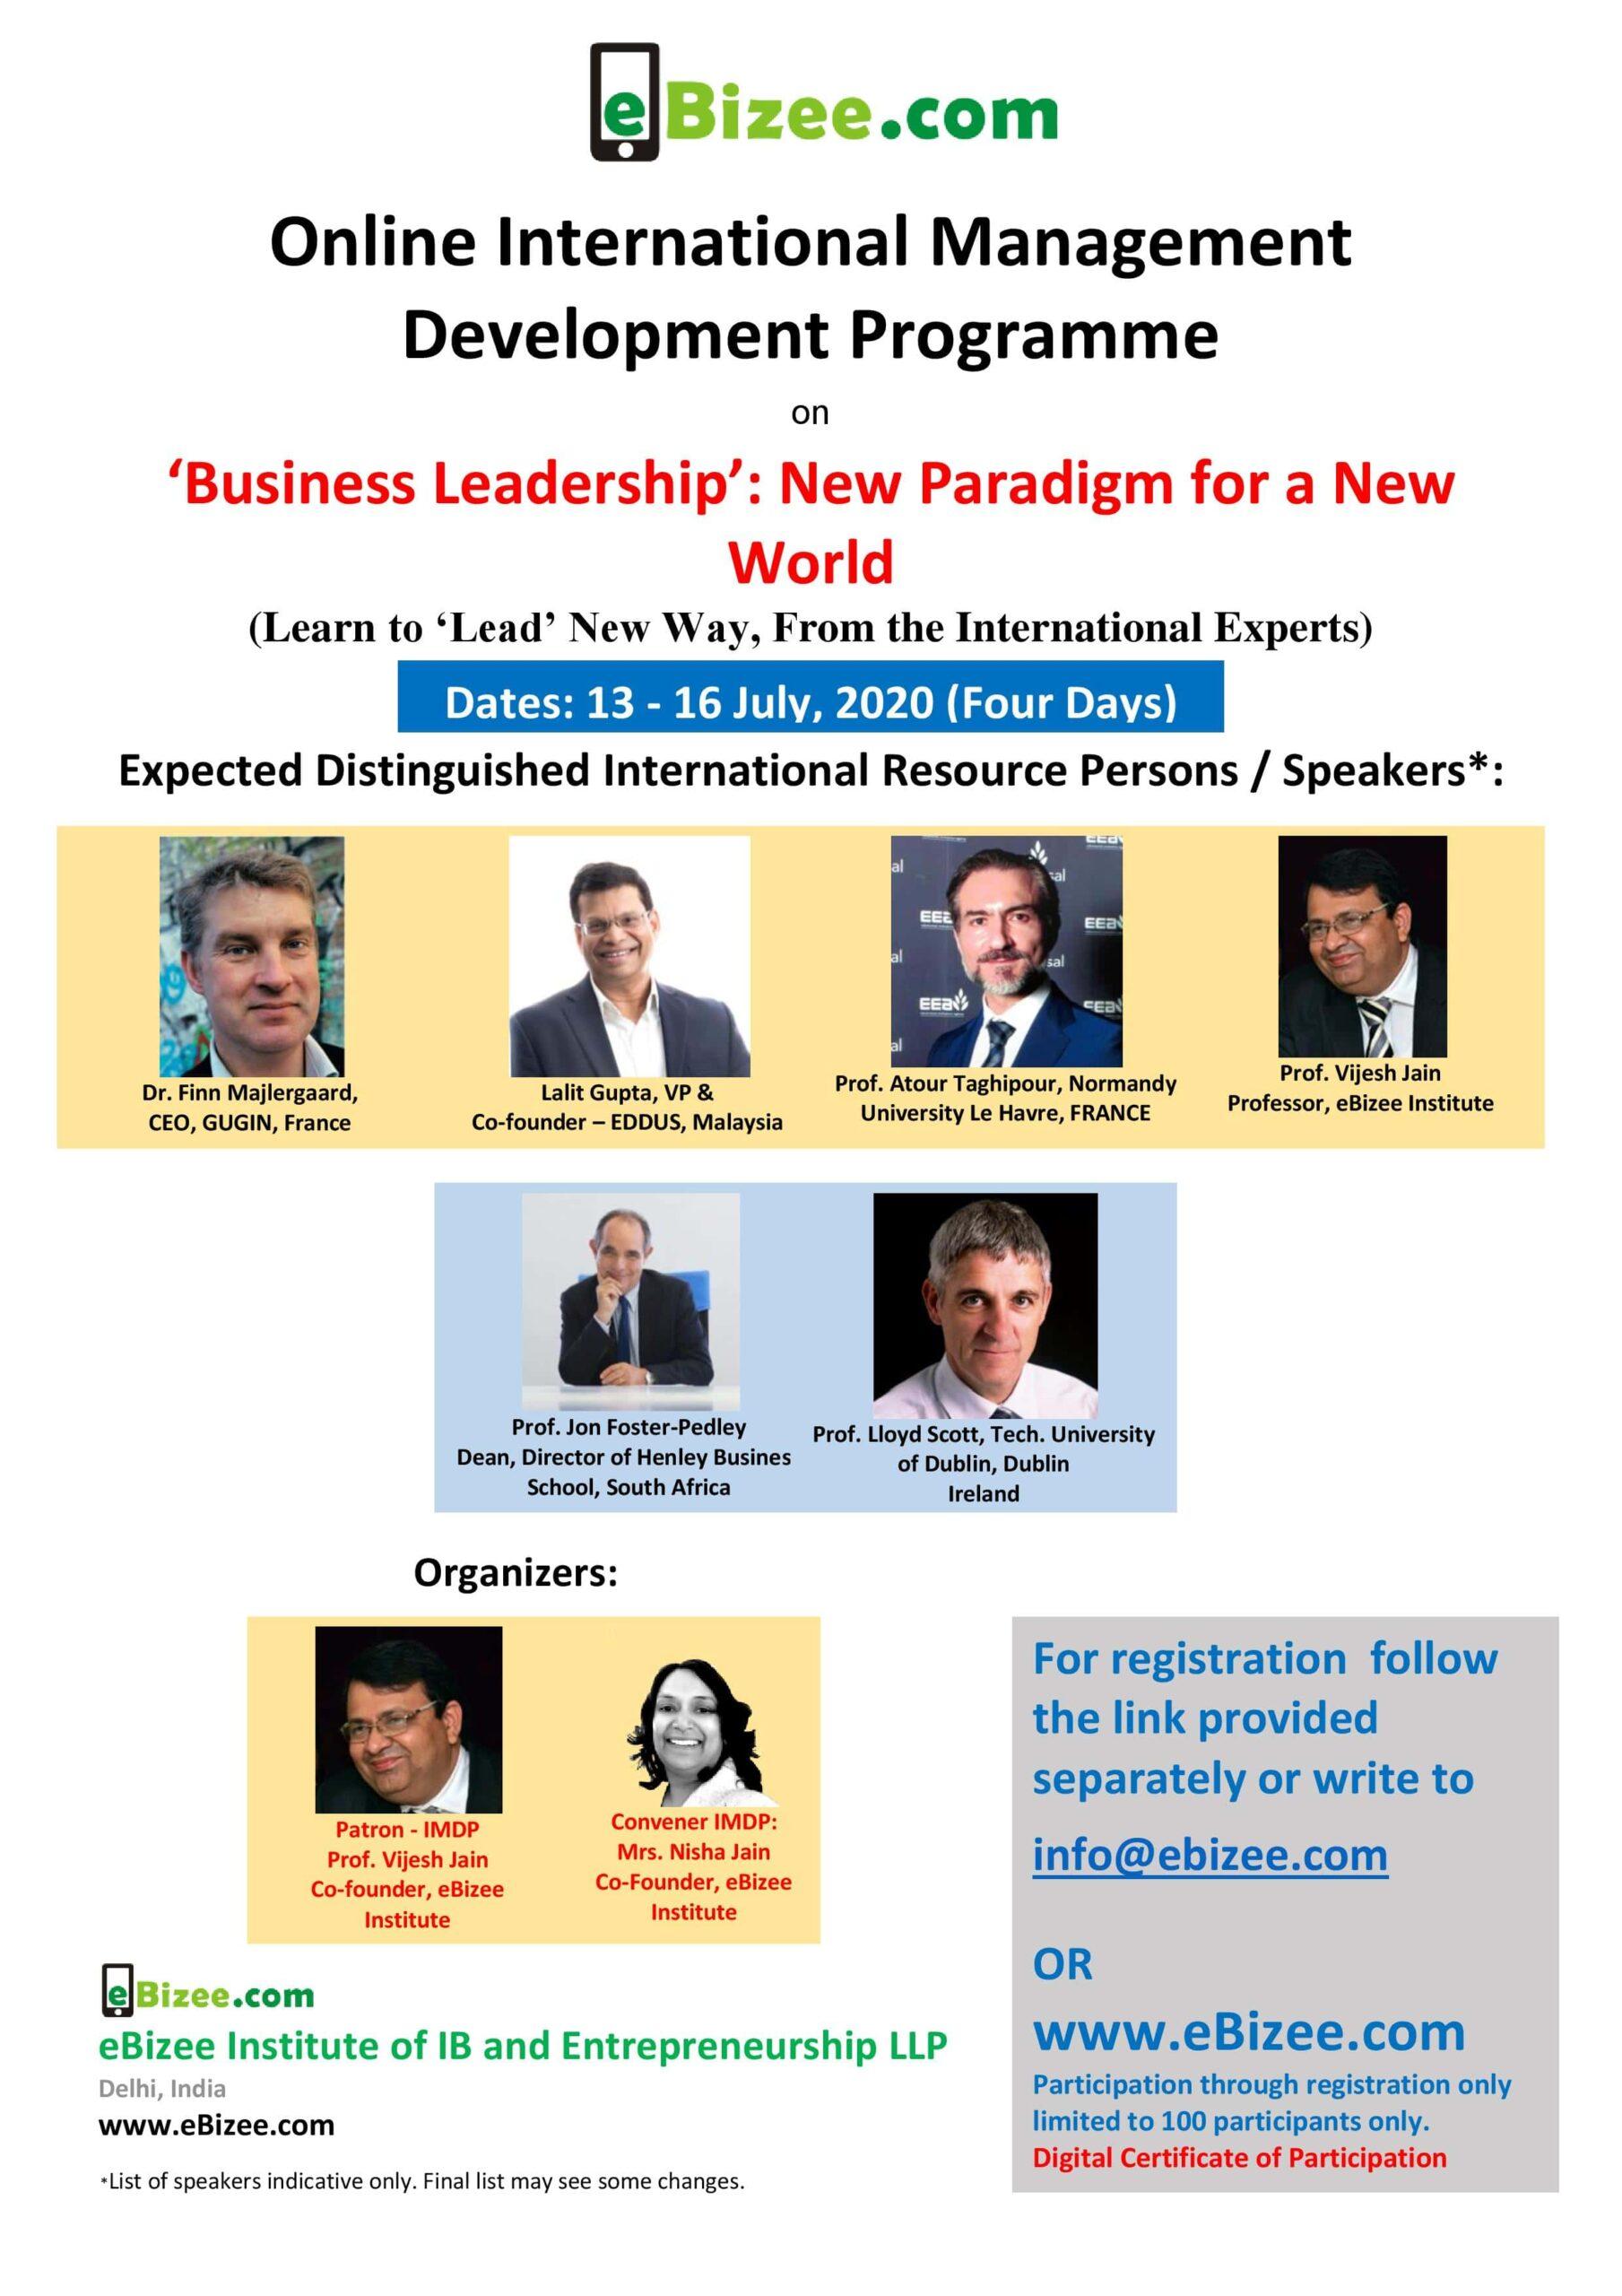 4 days IMDP on business leadership